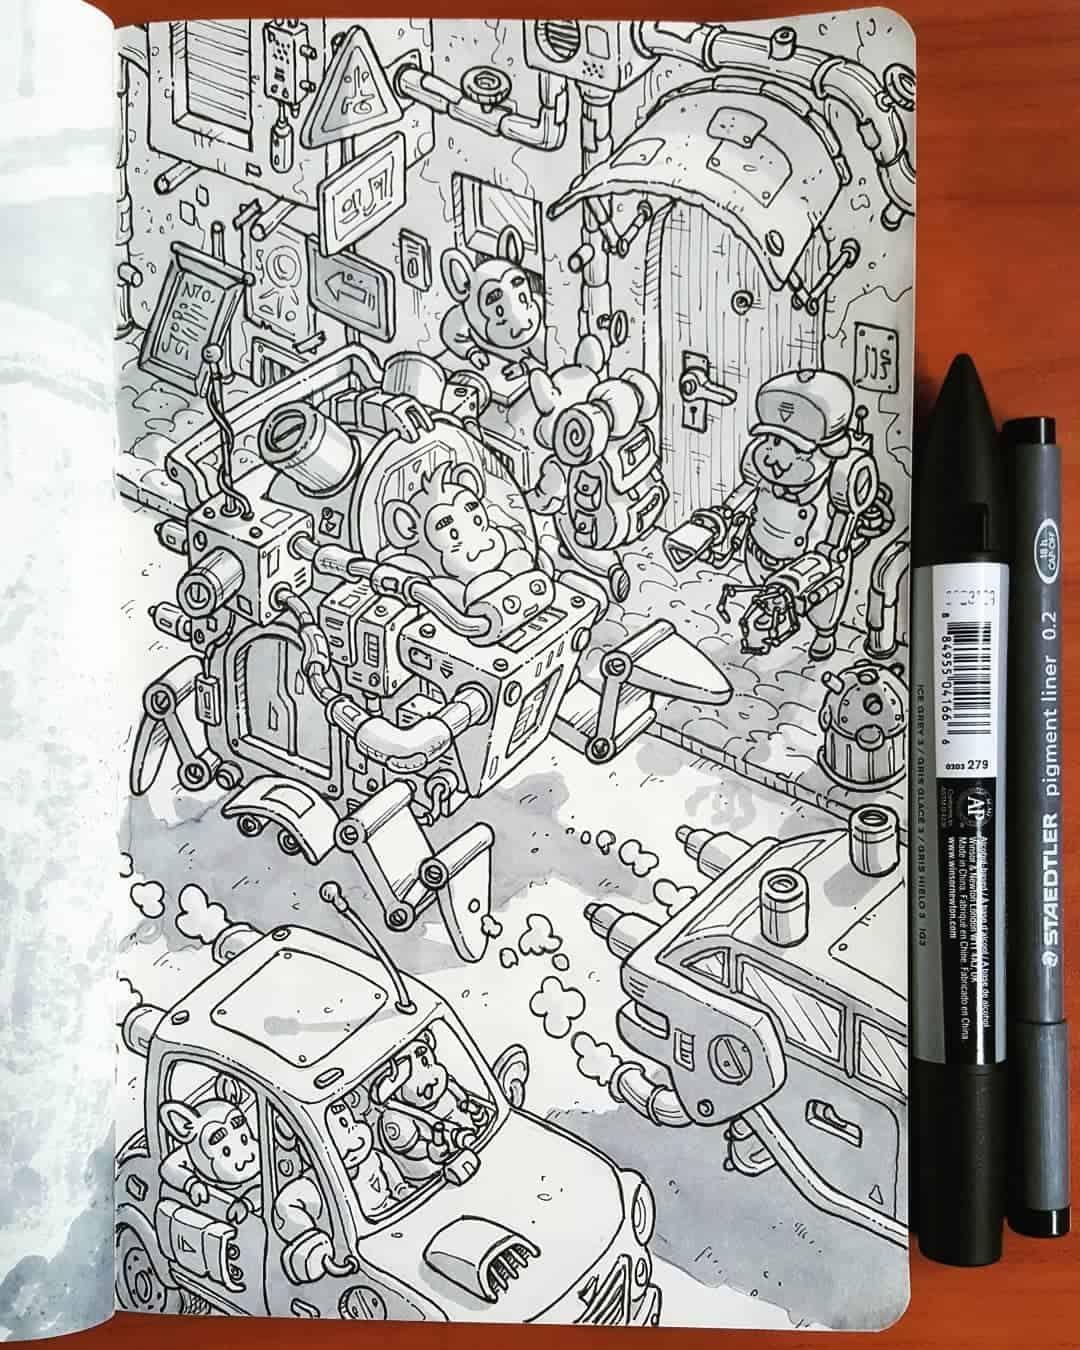 Illustrator Daniele Turturici